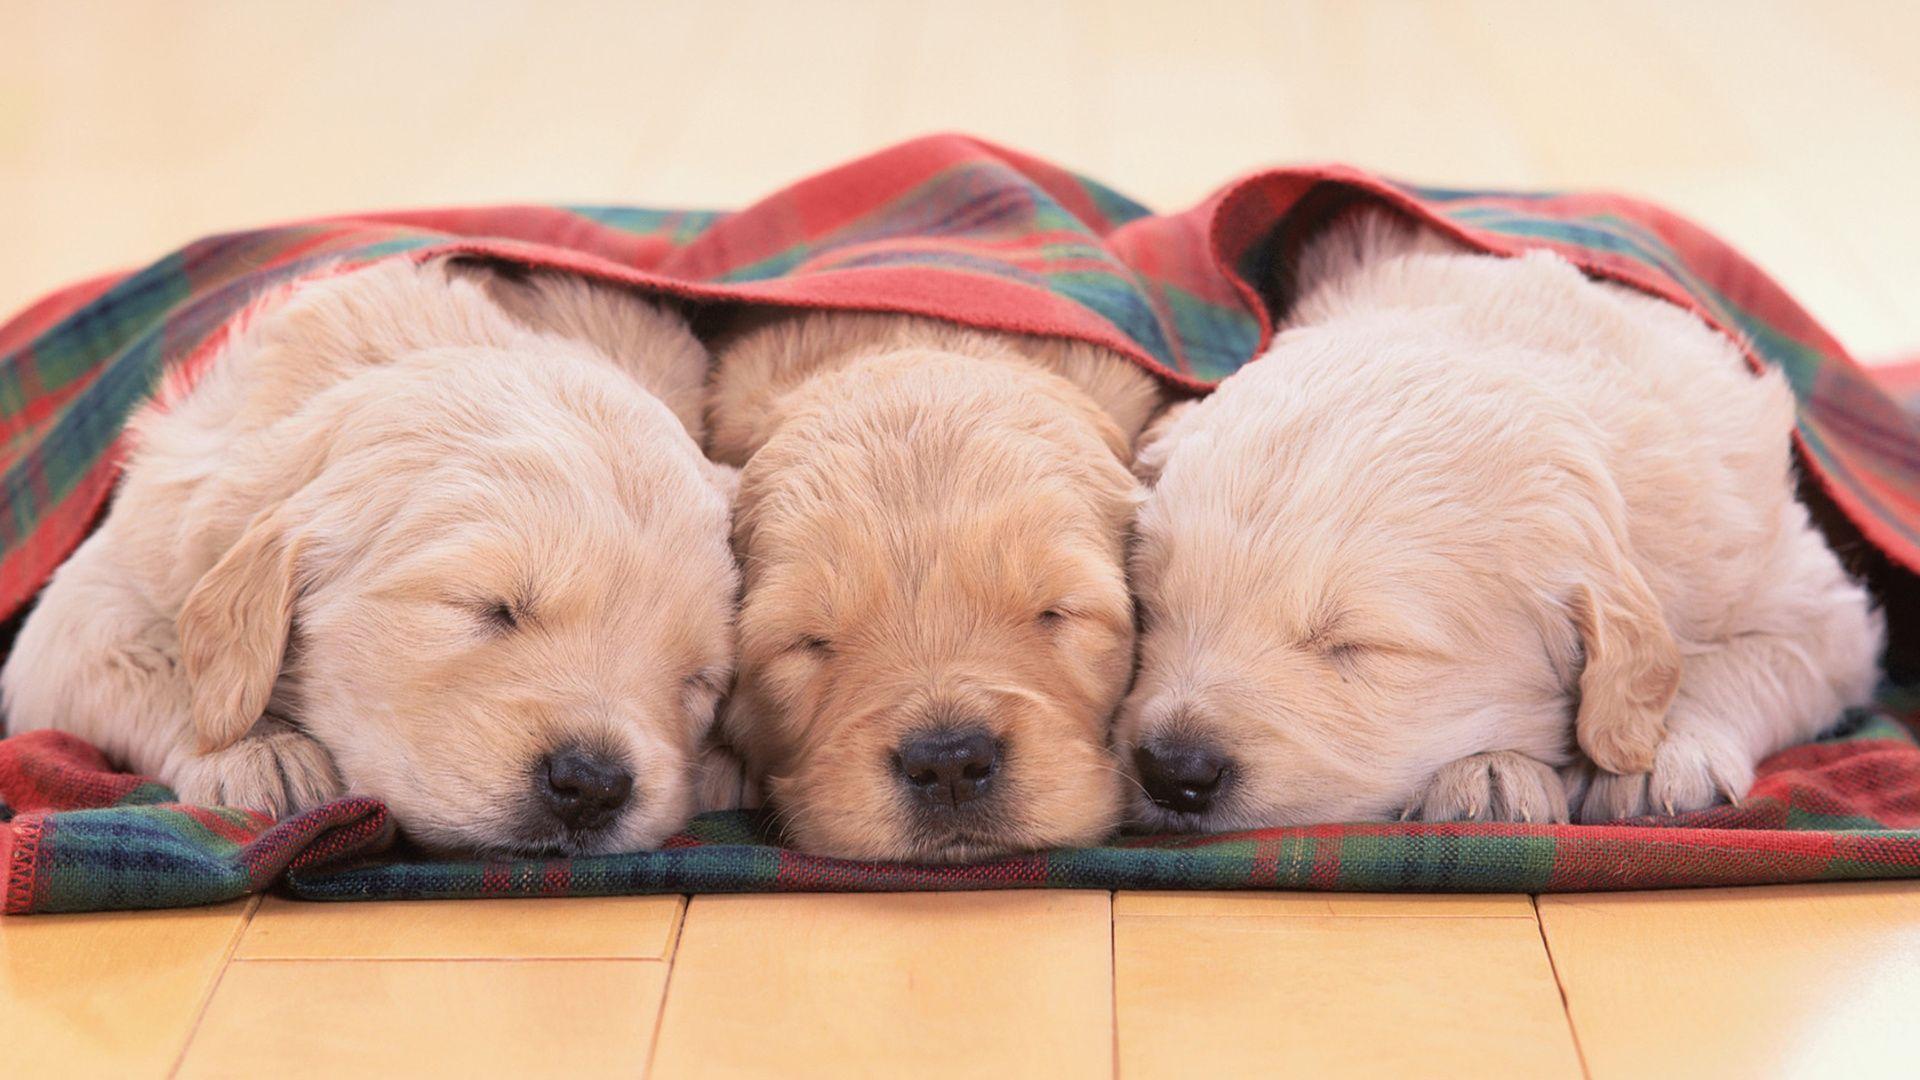 Puppies Cute Desktopia Animals Wallpapers Sleeping Puppies Retriever Puppy Golden Retriever